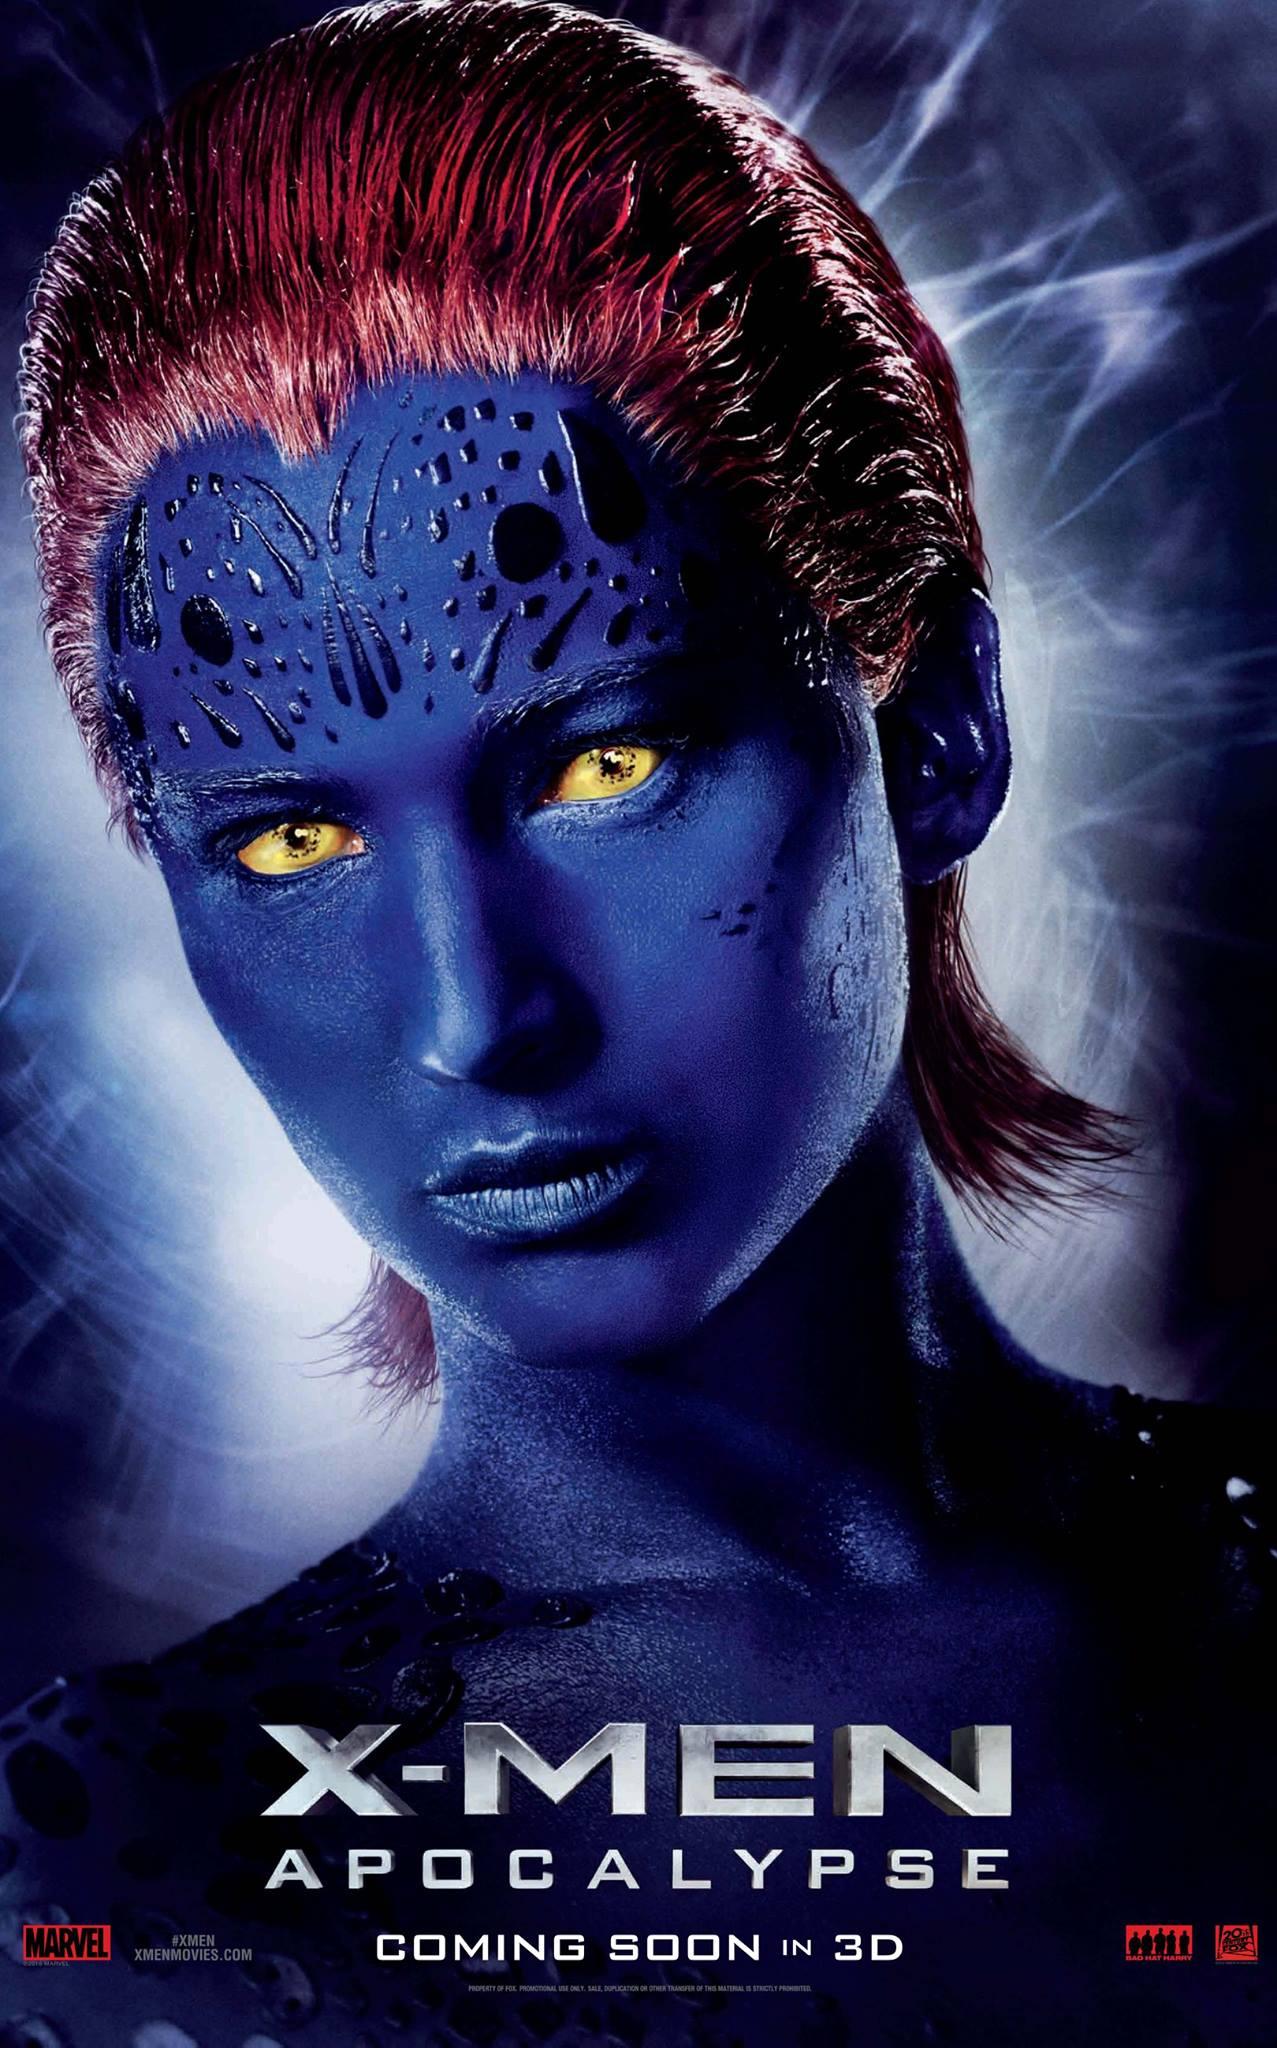 Mystique character poster